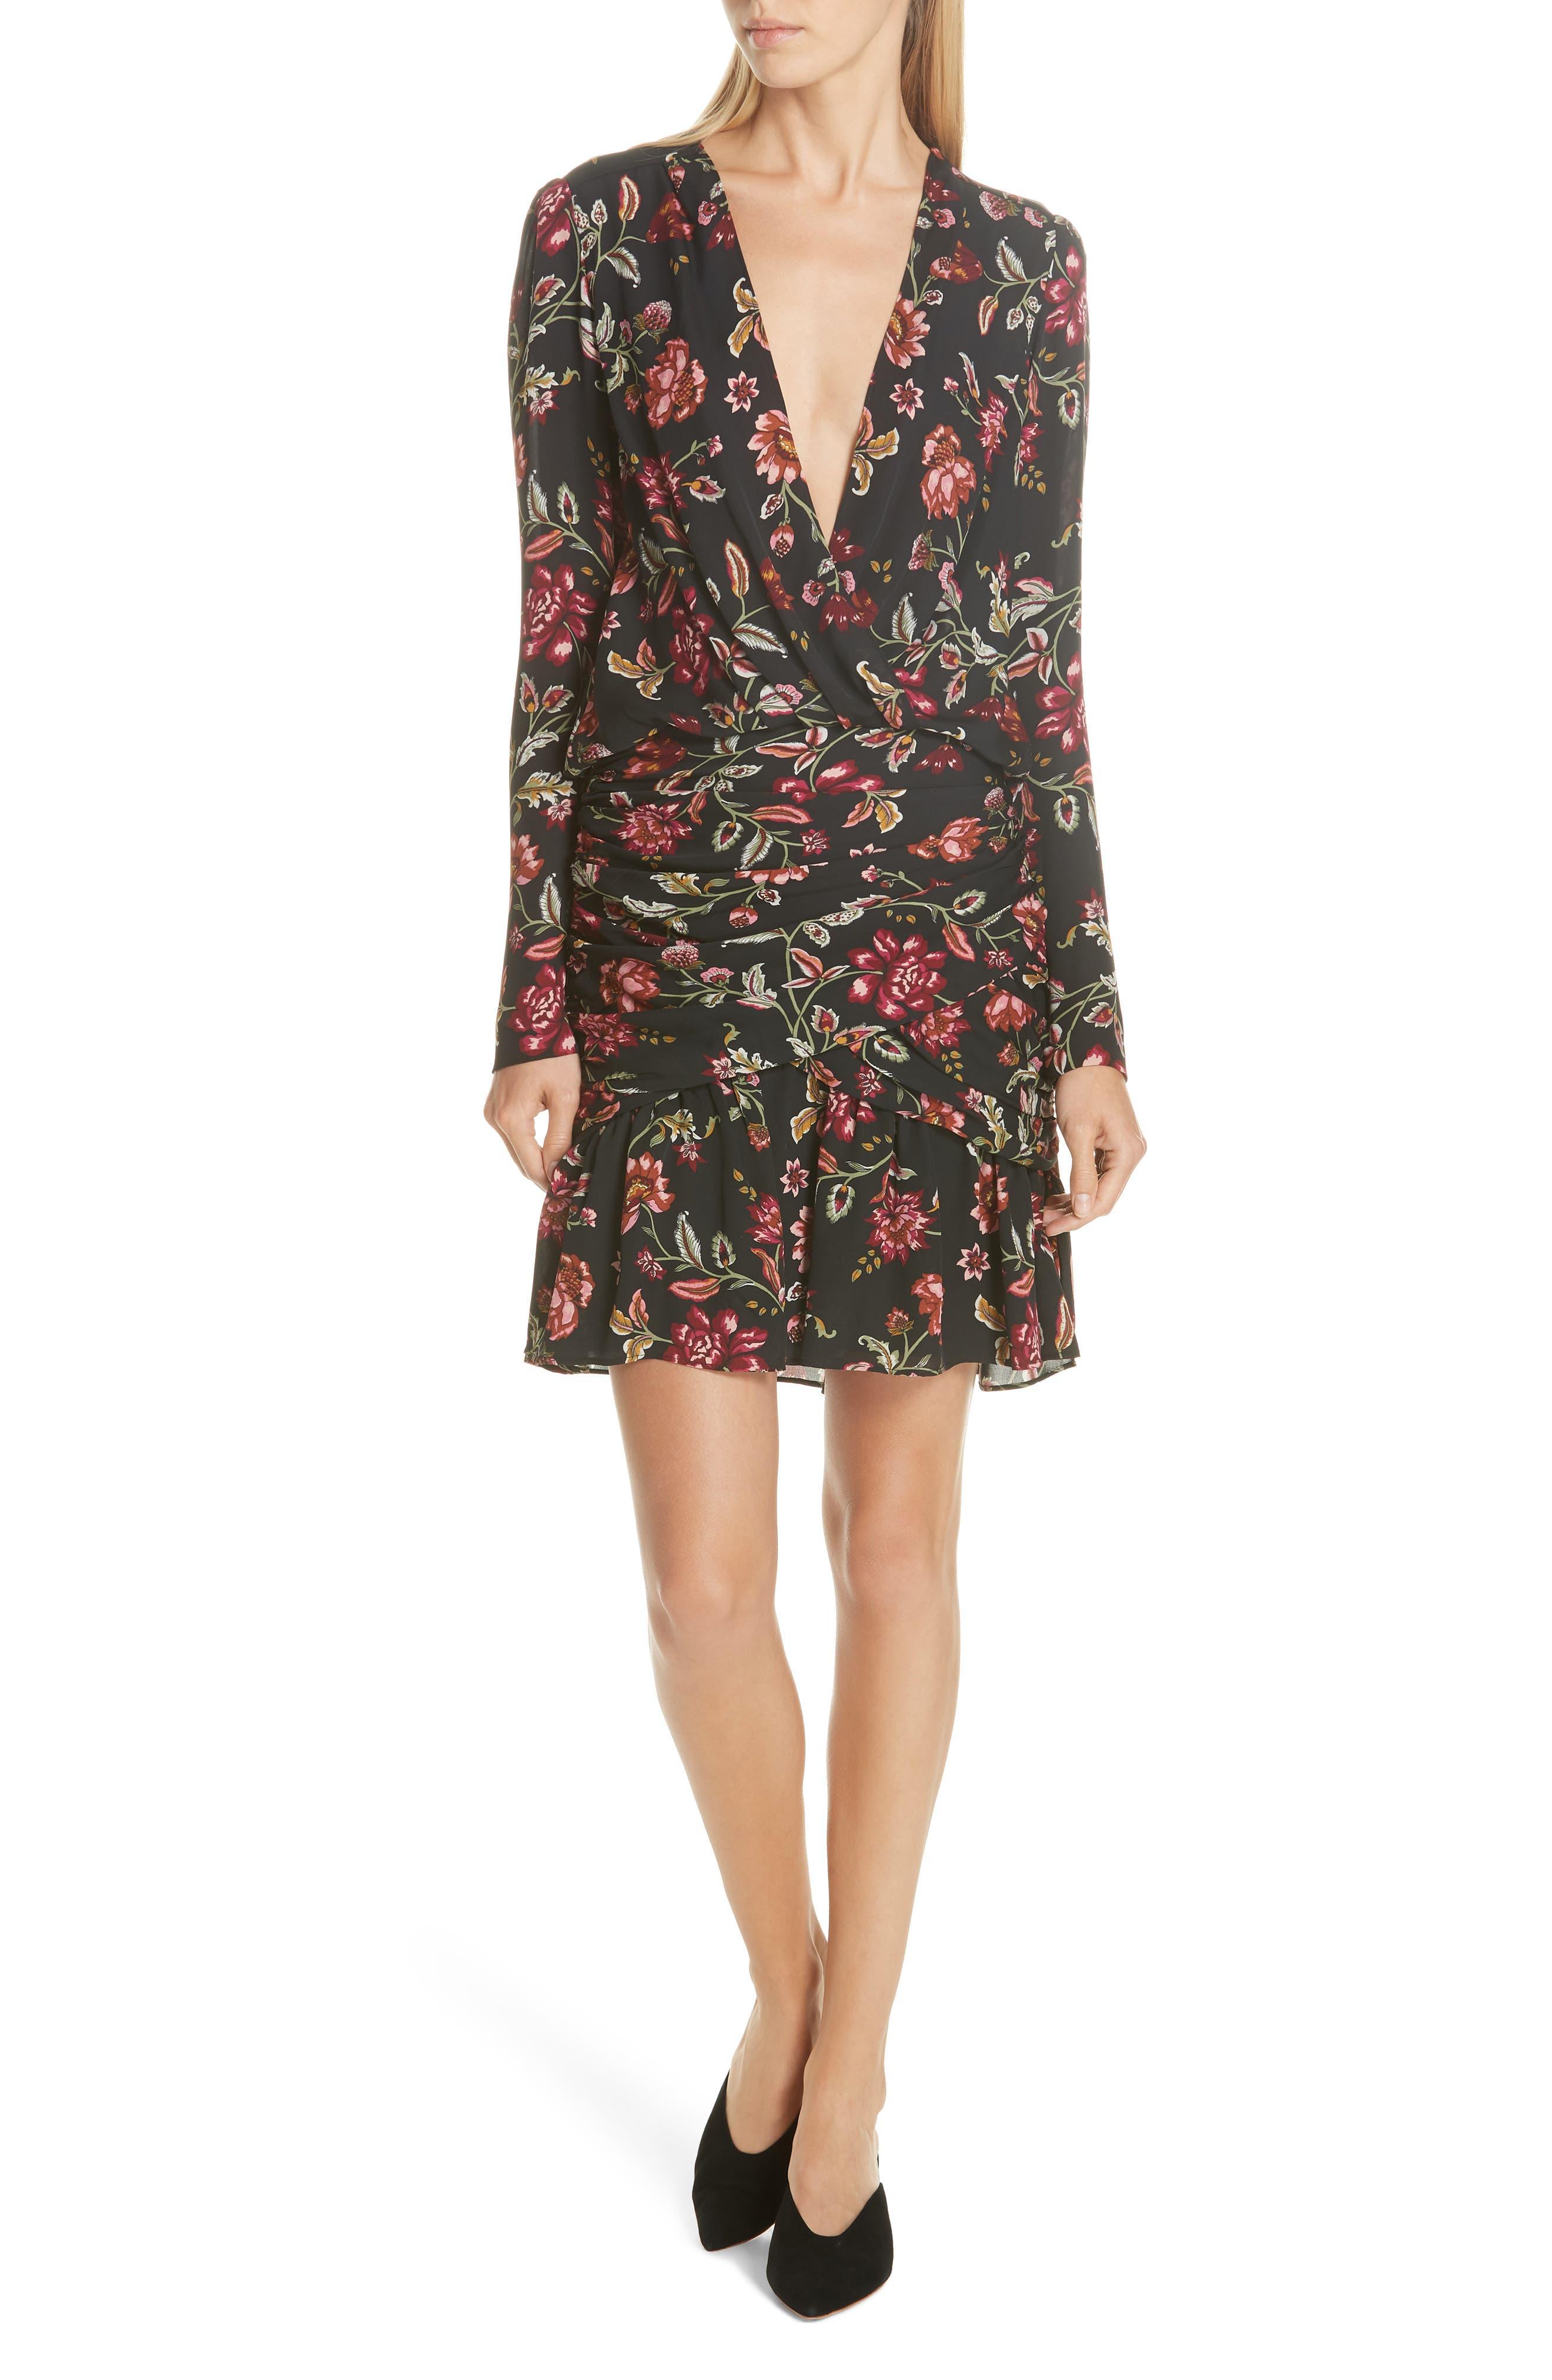 A.l.c. Haven Ruched Floral Print Silk Dress